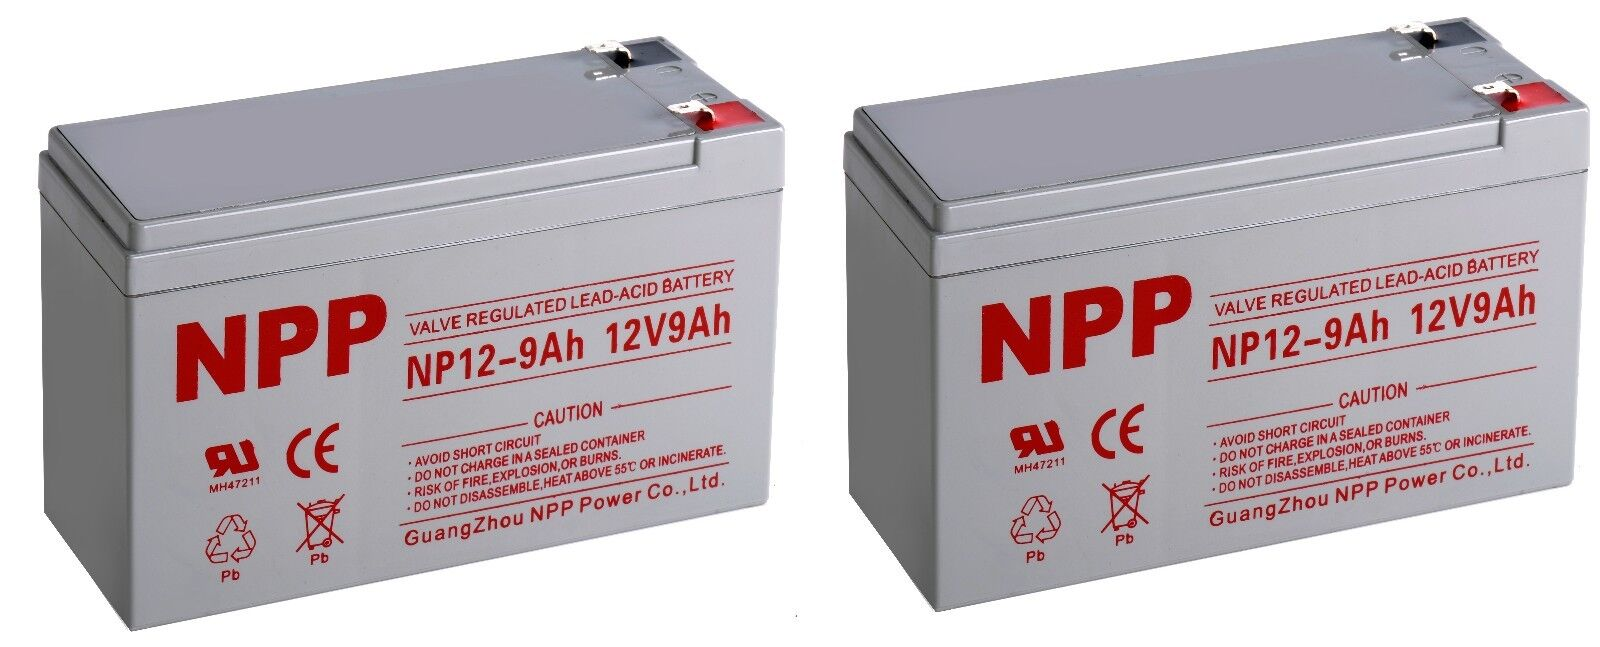 NPP 12V 9Ah 12Volt 9 amp Rechargeable Sealed Lead Acid Battery F2/ (2pcs)